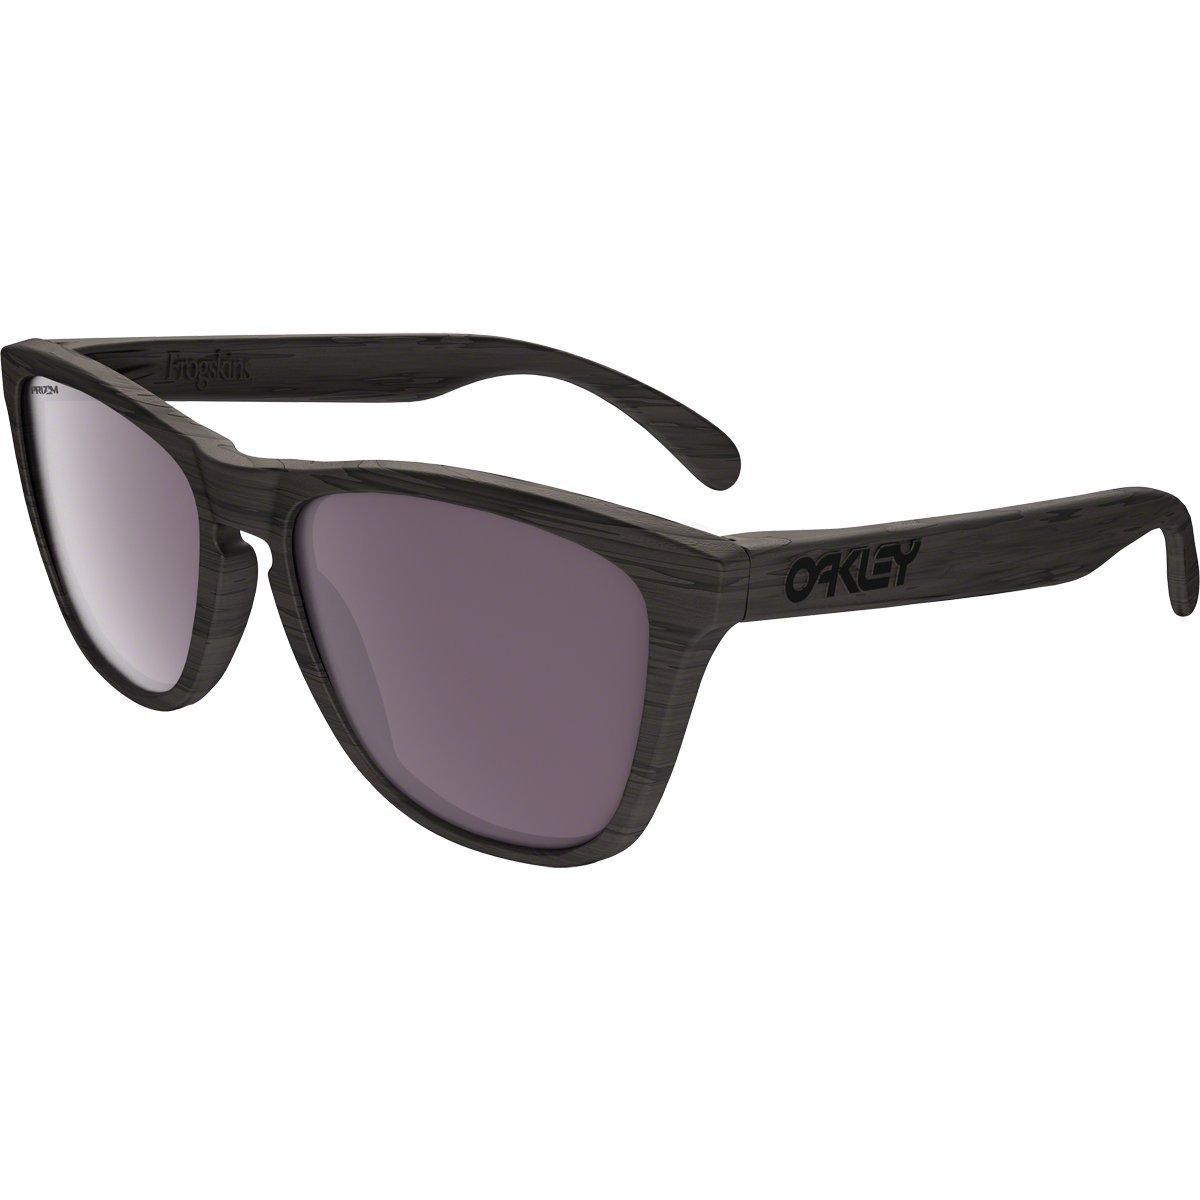 Oakley Men's Frogskins Polarized Iridium Square Sunglasses, Woodgrain, 55 mm